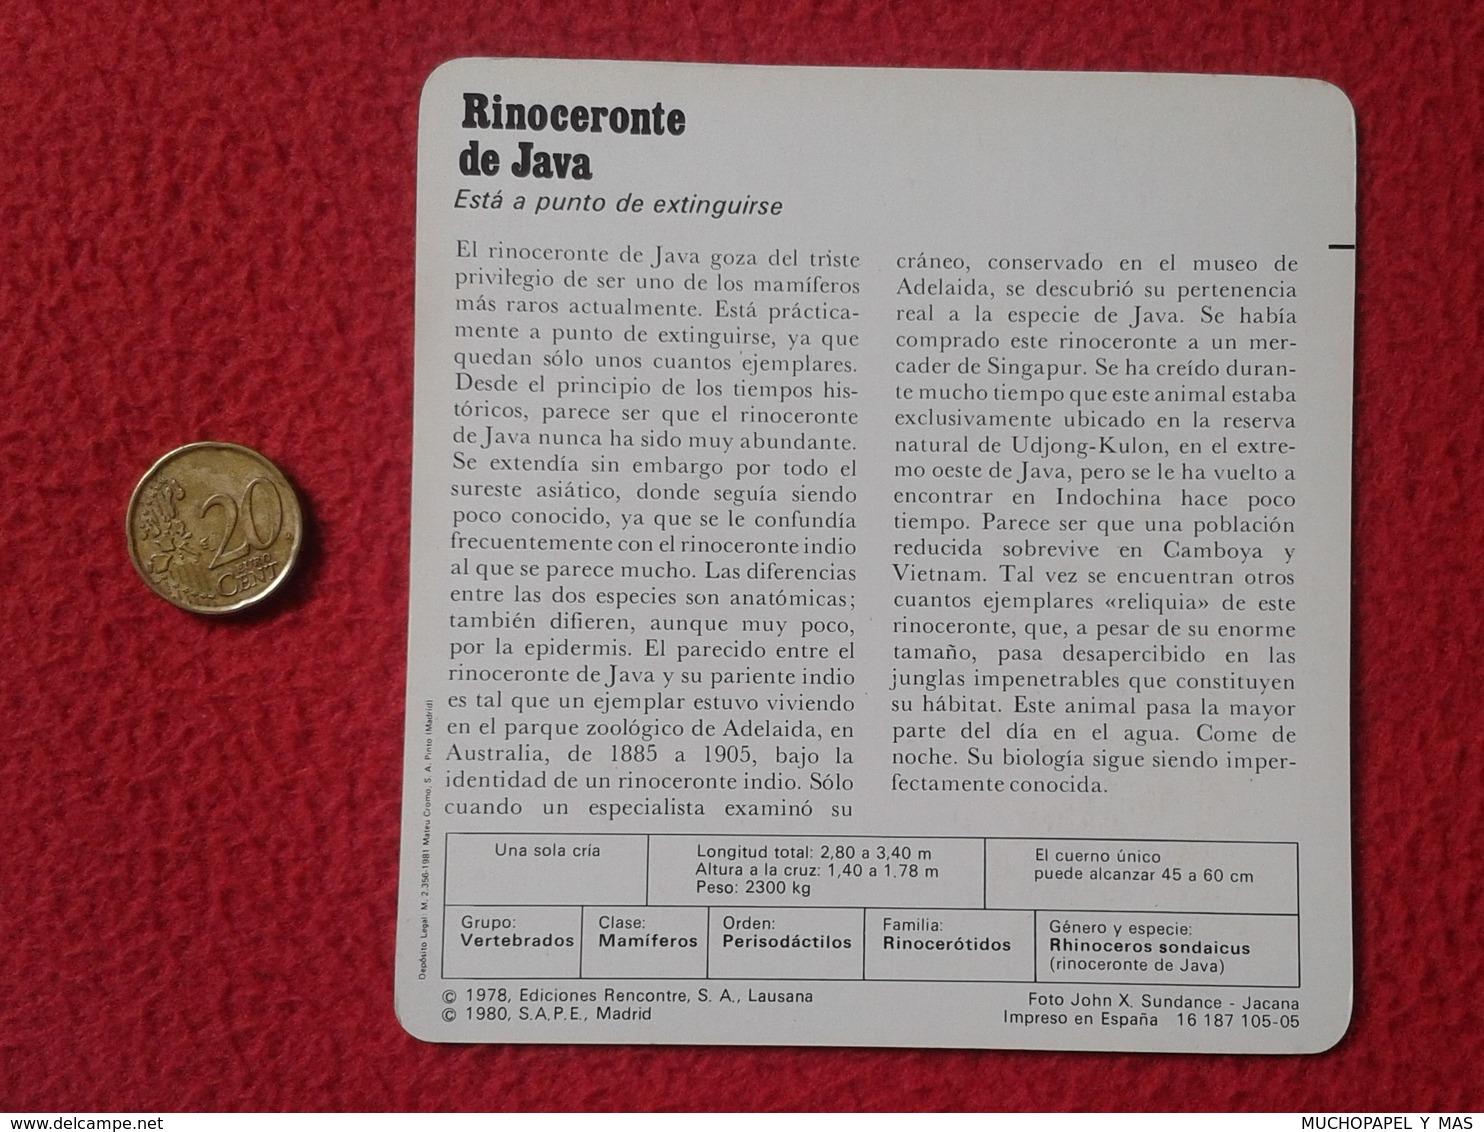 ESPAGNE SPAIN FICHA SHEET FICHE RINOCERONTE DE JAVA RHINO RHINOCEROS RHINOS RHINOCEROSES RINOCERONTES WILDLIFE FAUNA VER - Animales